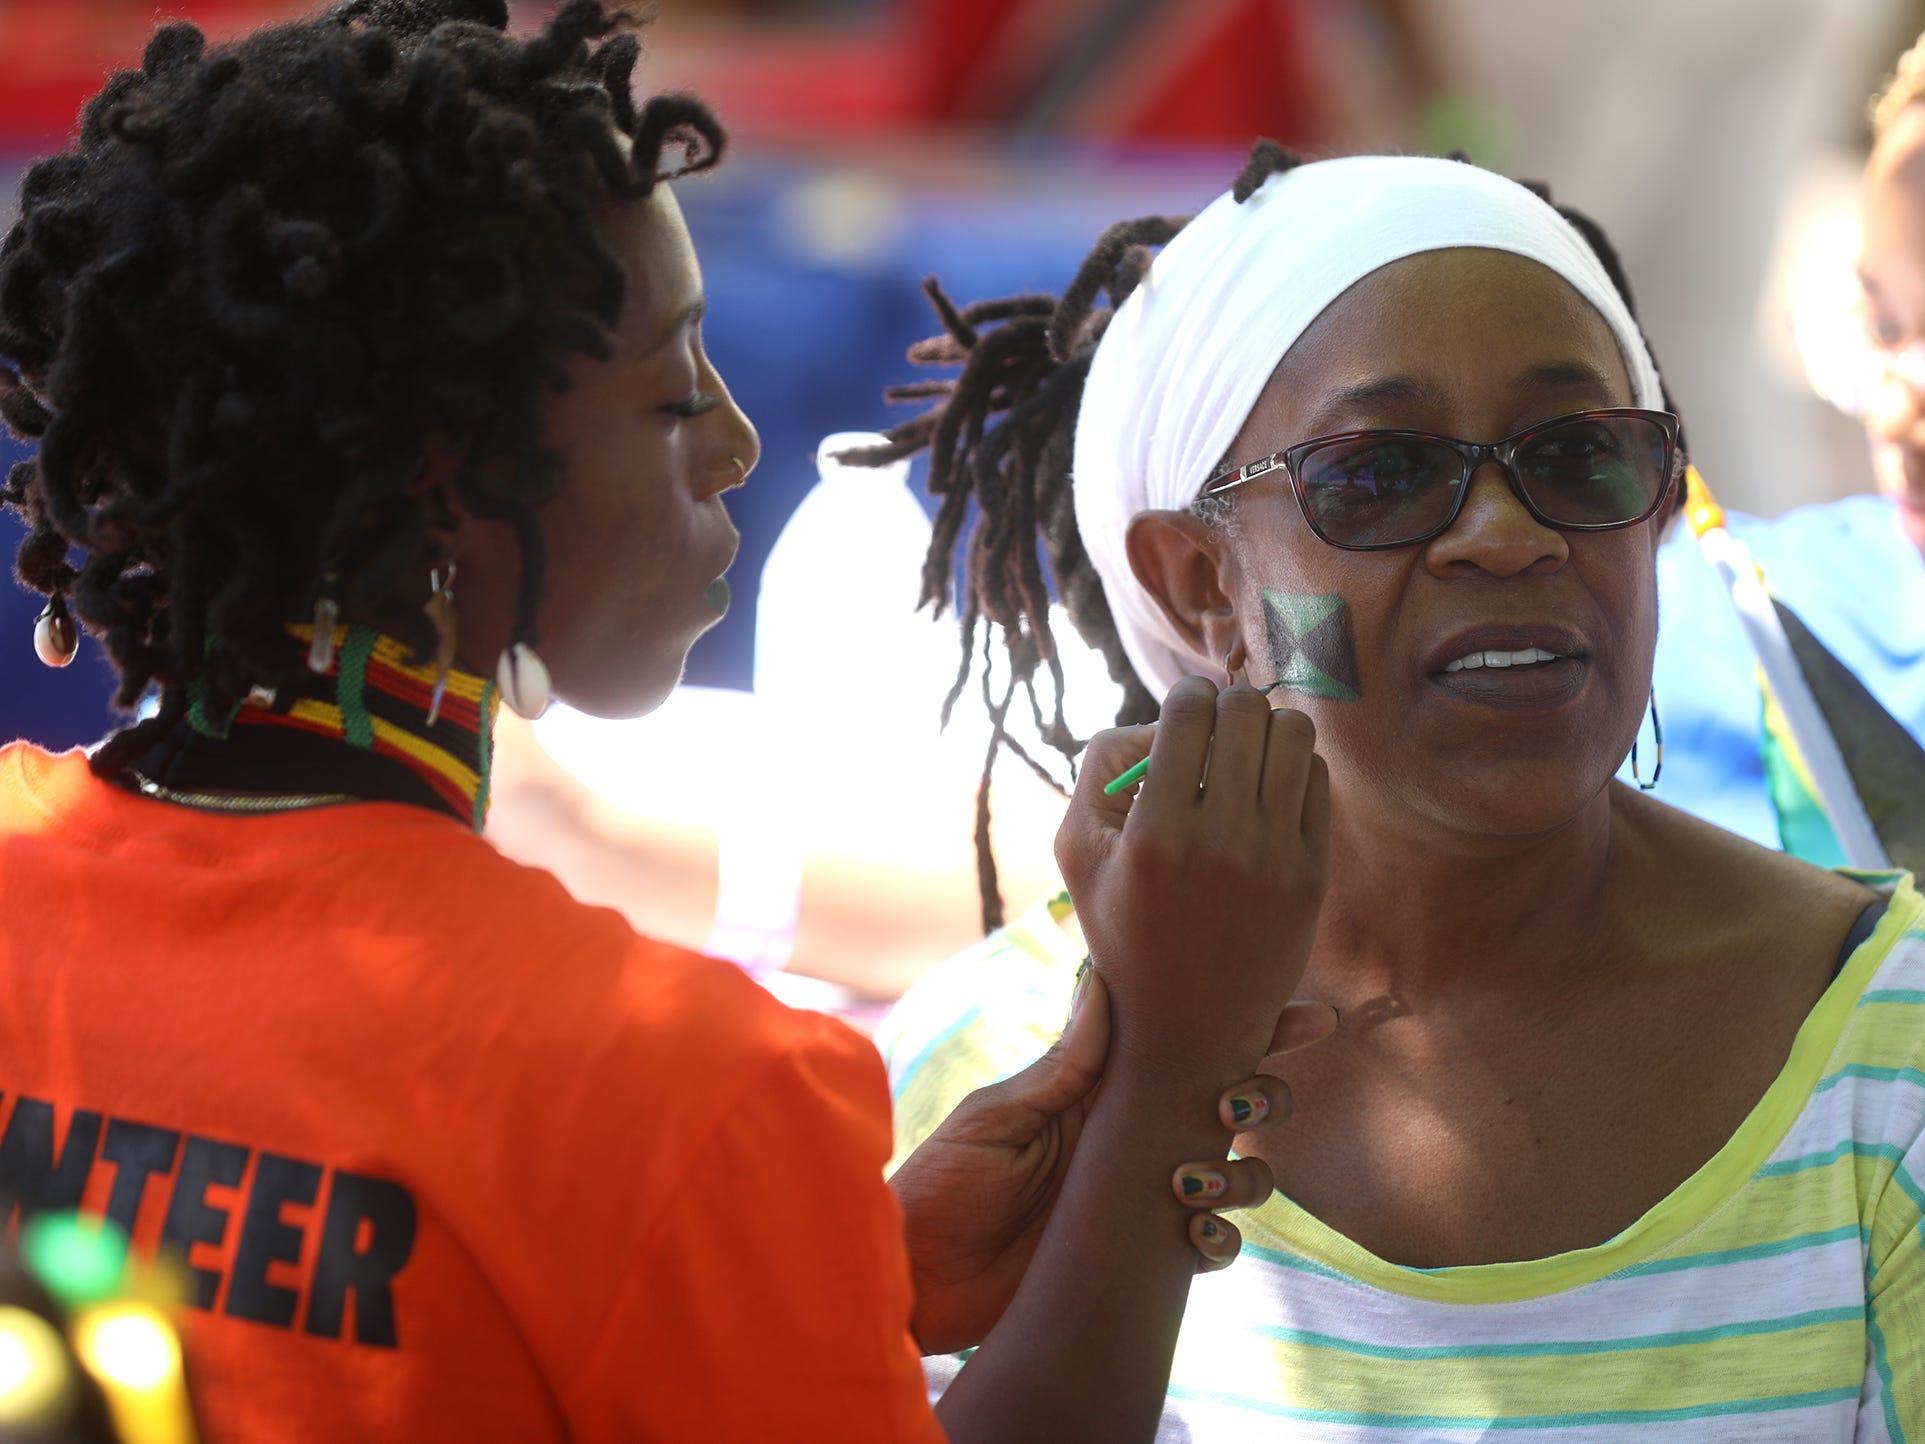 Damali Underwood paints the flag of Jamaica on Eunice Bernard's cheek.